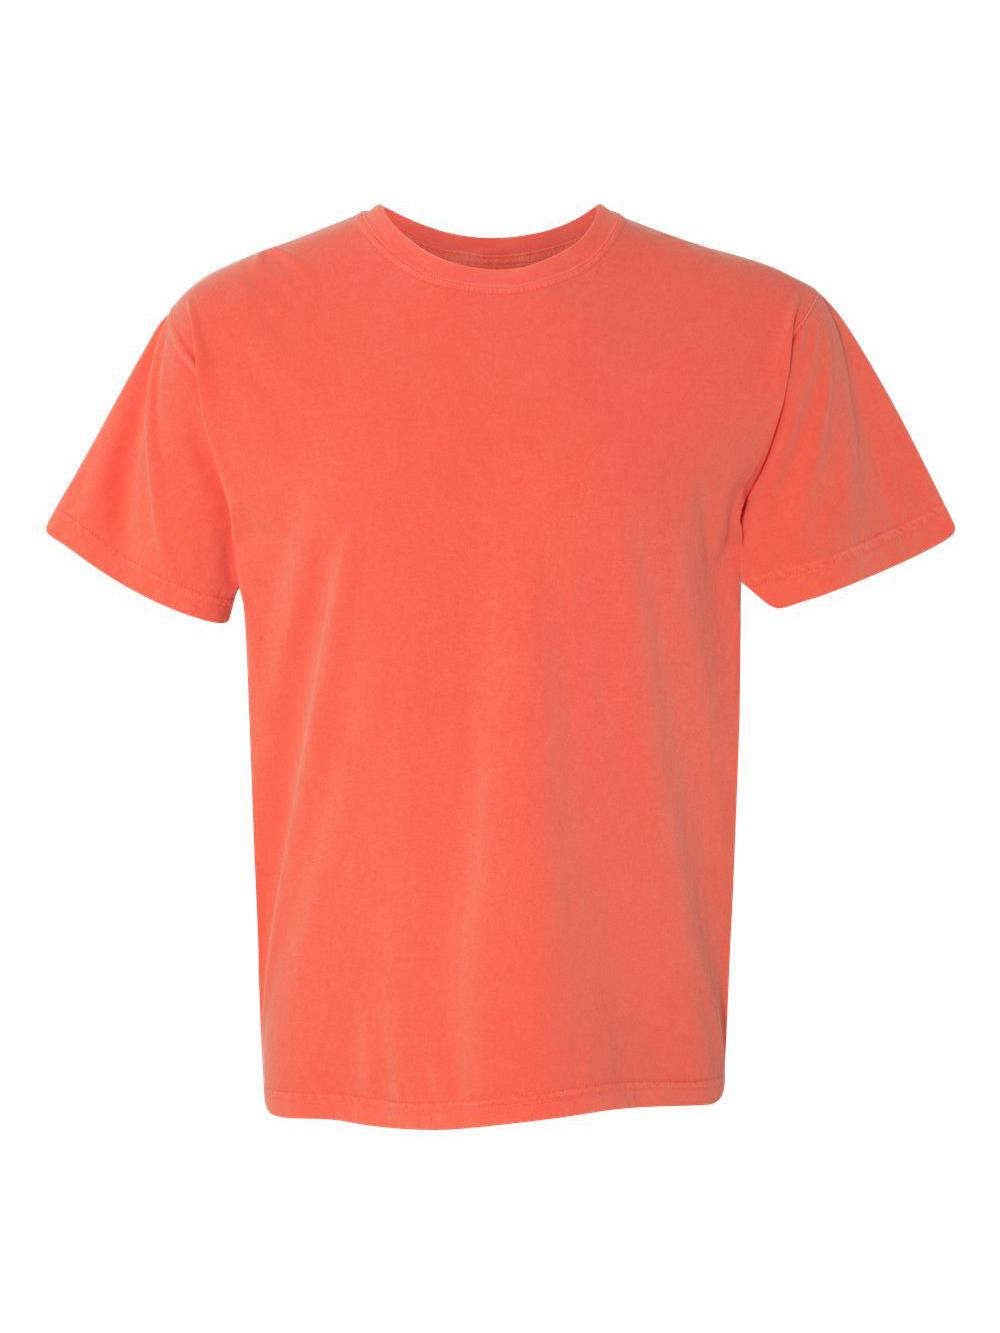 Comfort-Colors-Garment-Dyed-Heavyweight-Ringspun-Short-Sleeve-Shirt-1717 thumbnail 21